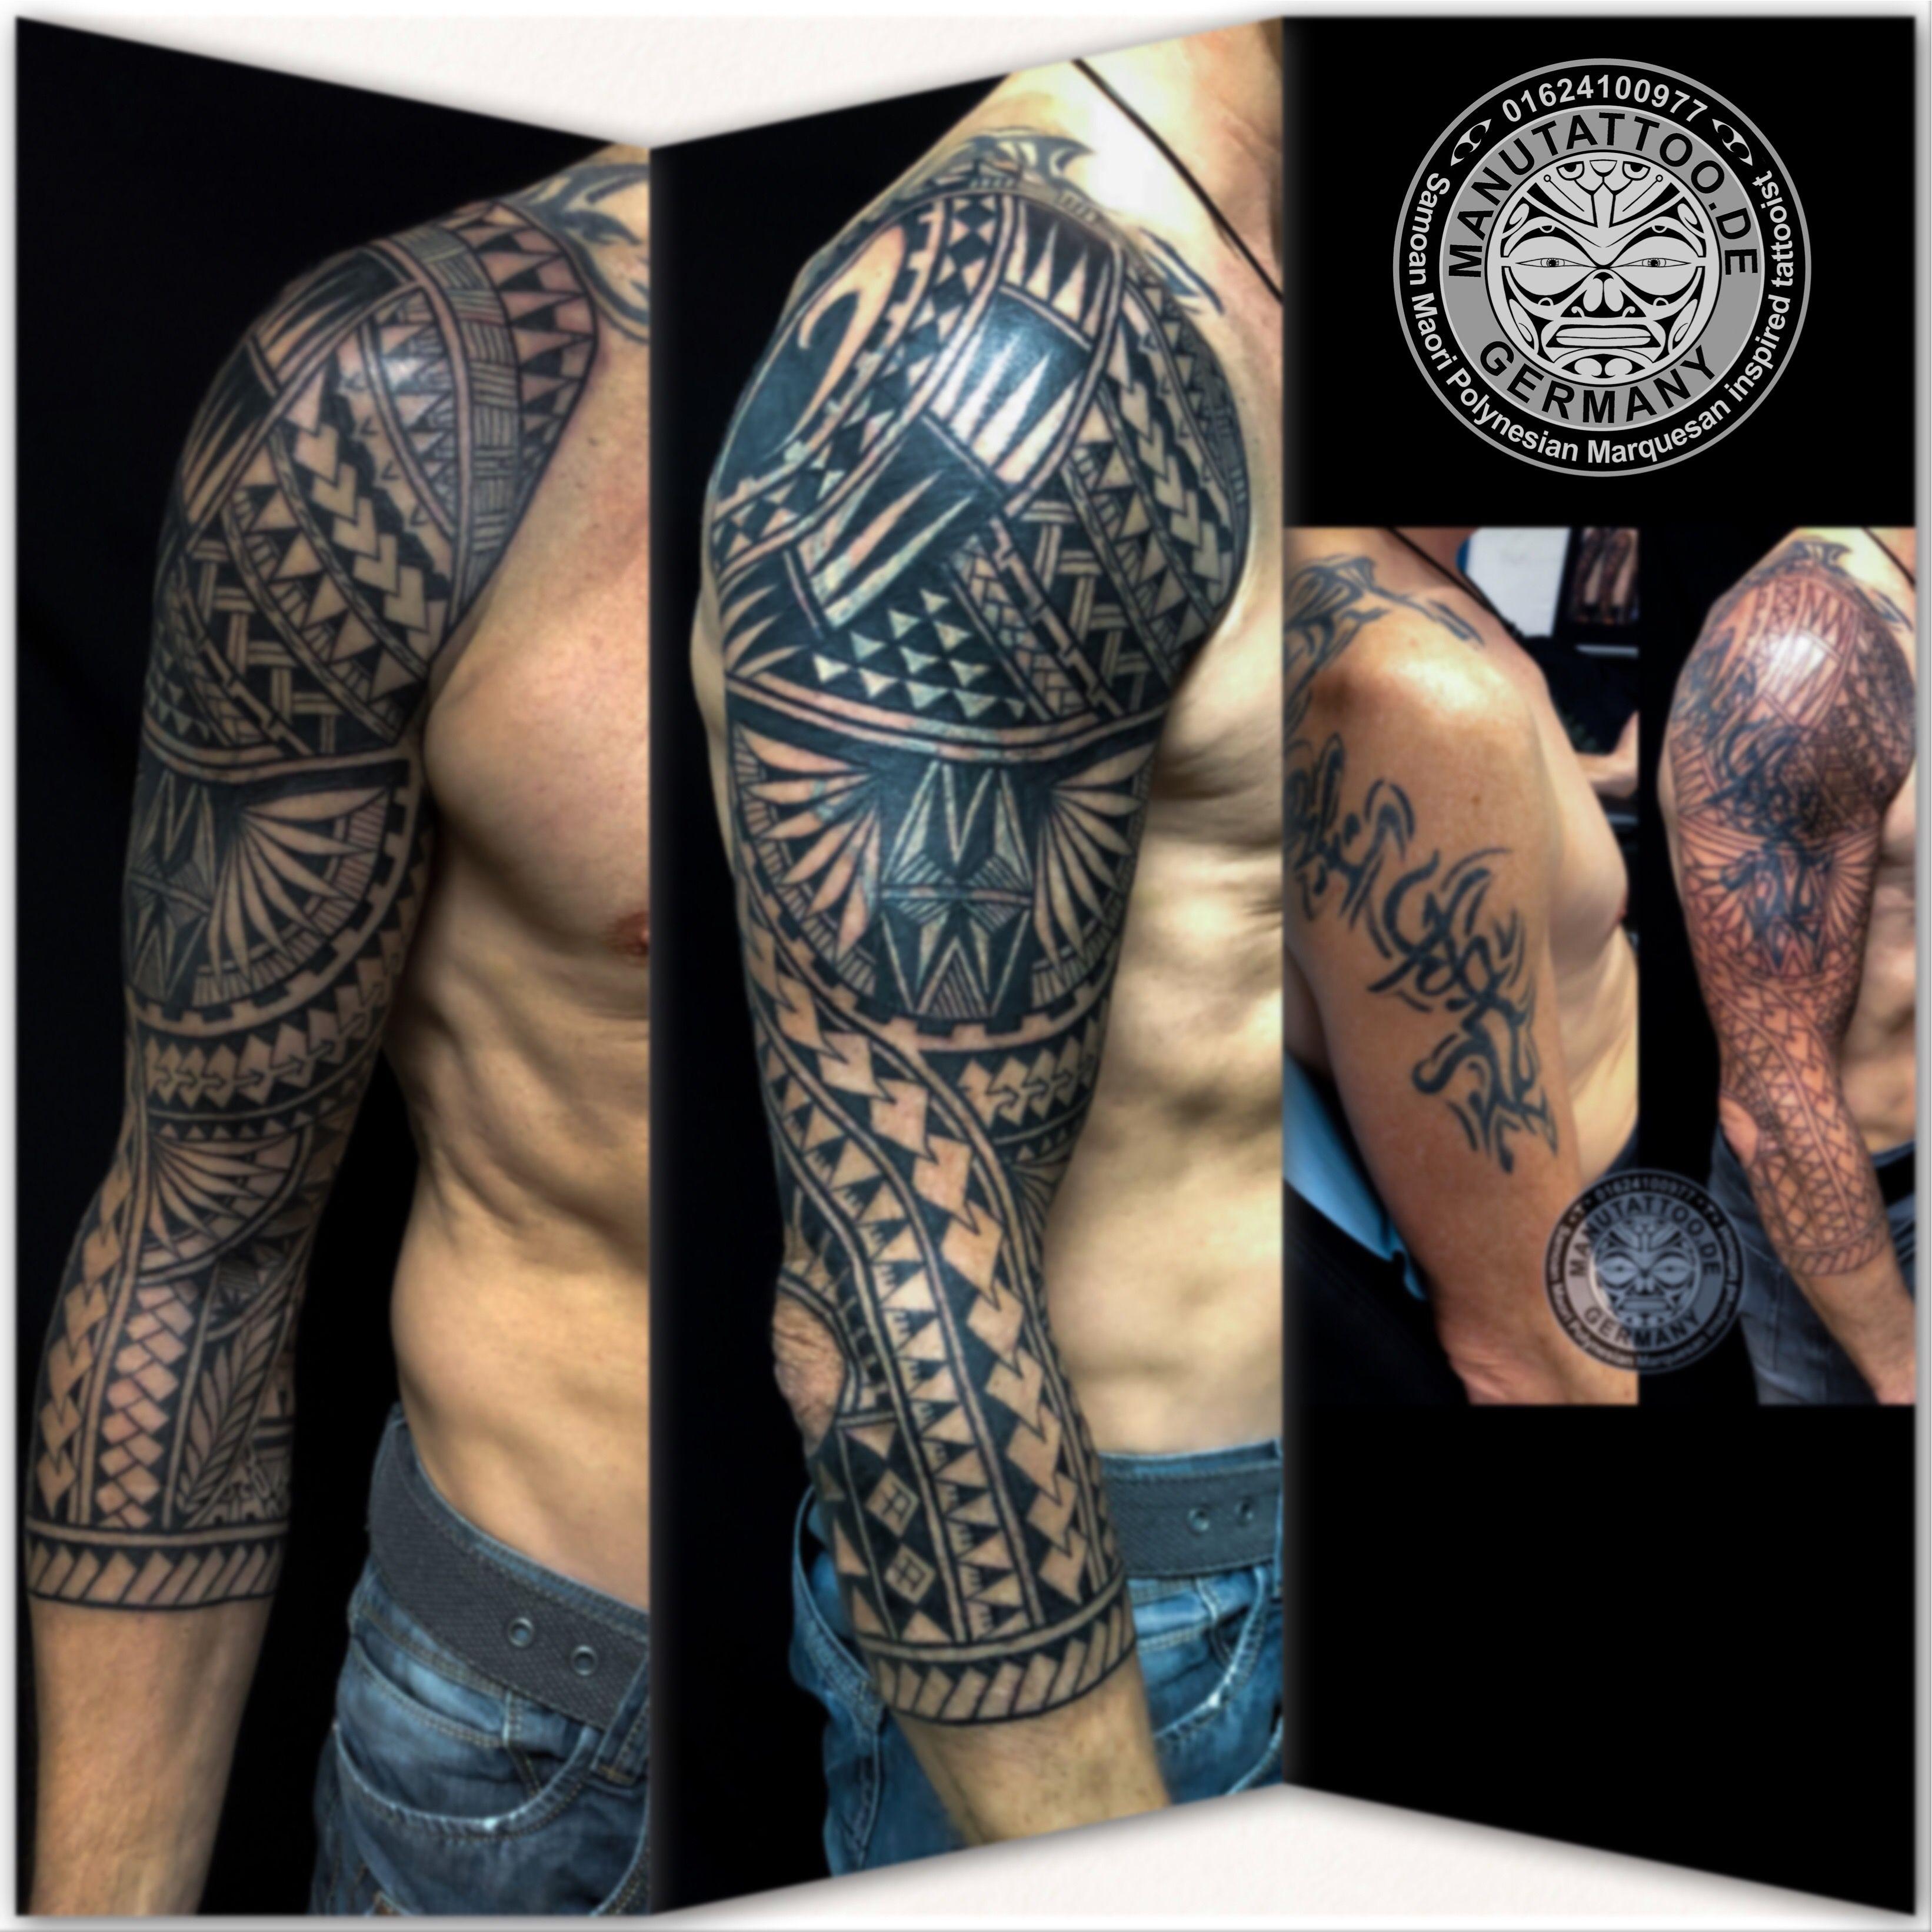 Freehand Polynesian Samoan Inspired Cover Up Tatowierungen Tattoos Manner Tattoo Ideen